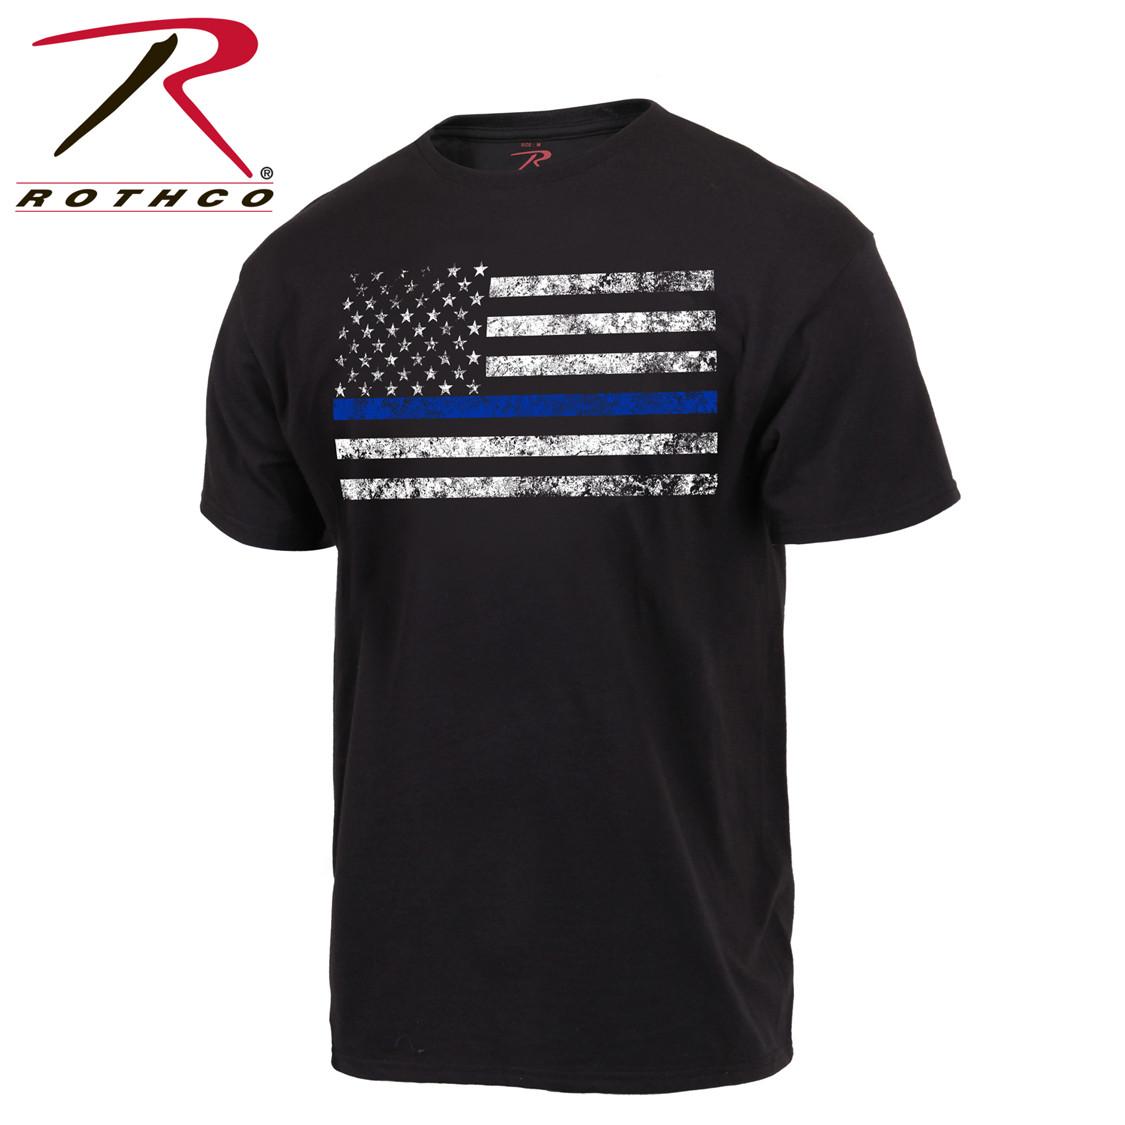 44de81eb49725 Shop Thin Blue Line Flag T Shirts - Fatigues Army Navy